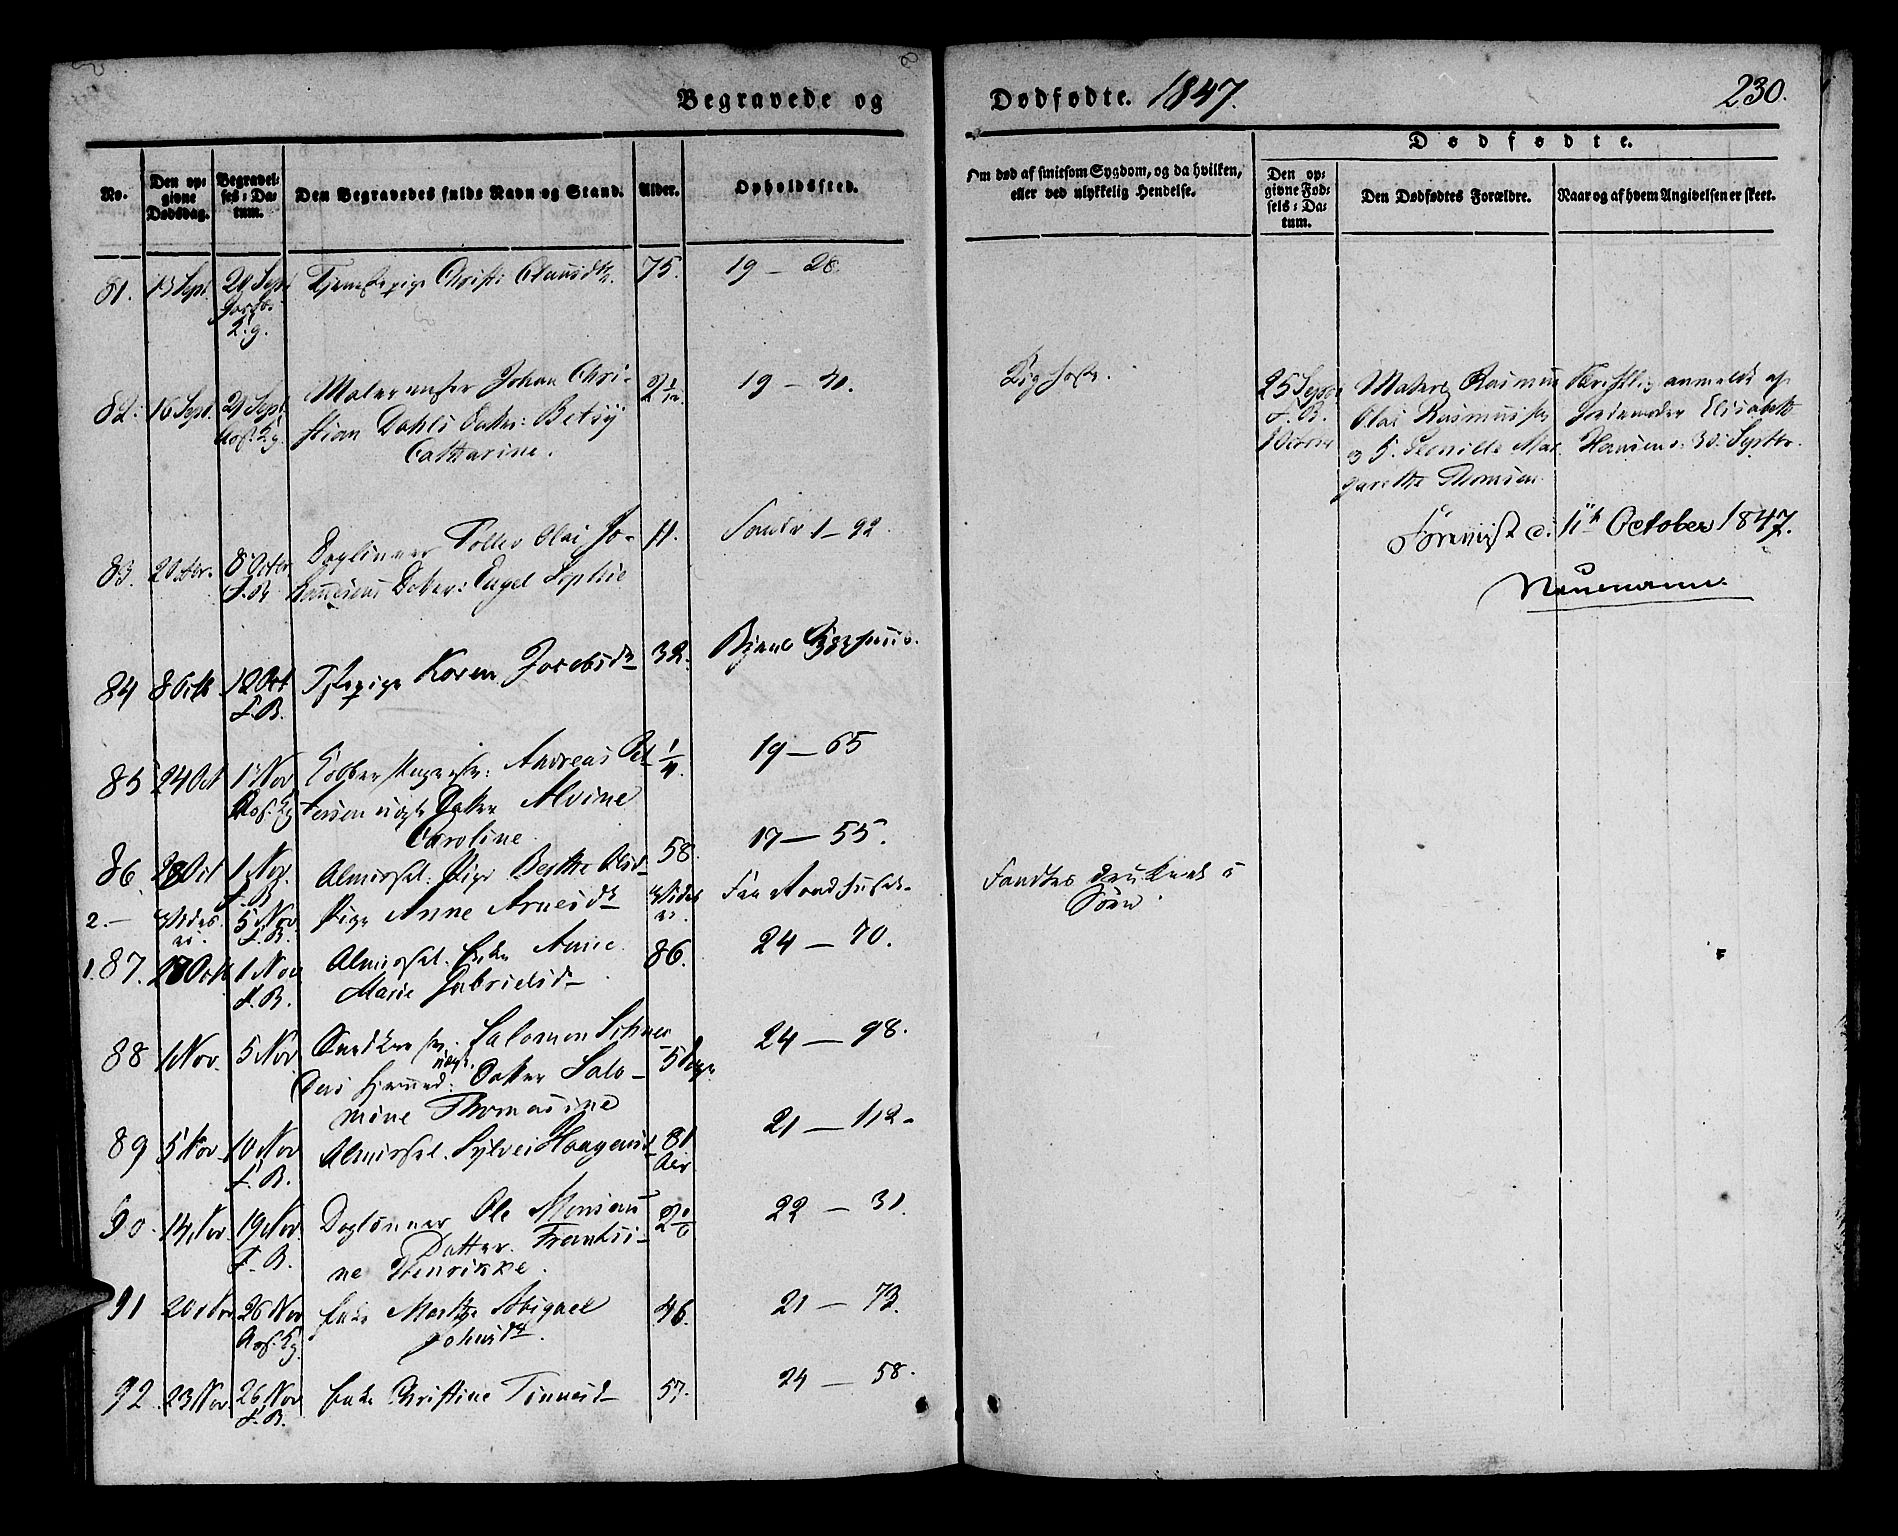 SAB, Korskirken Sokneprestembete, H/Haa/L0043: Ministerialbok nr. E 1, 1834-1848, s. 230